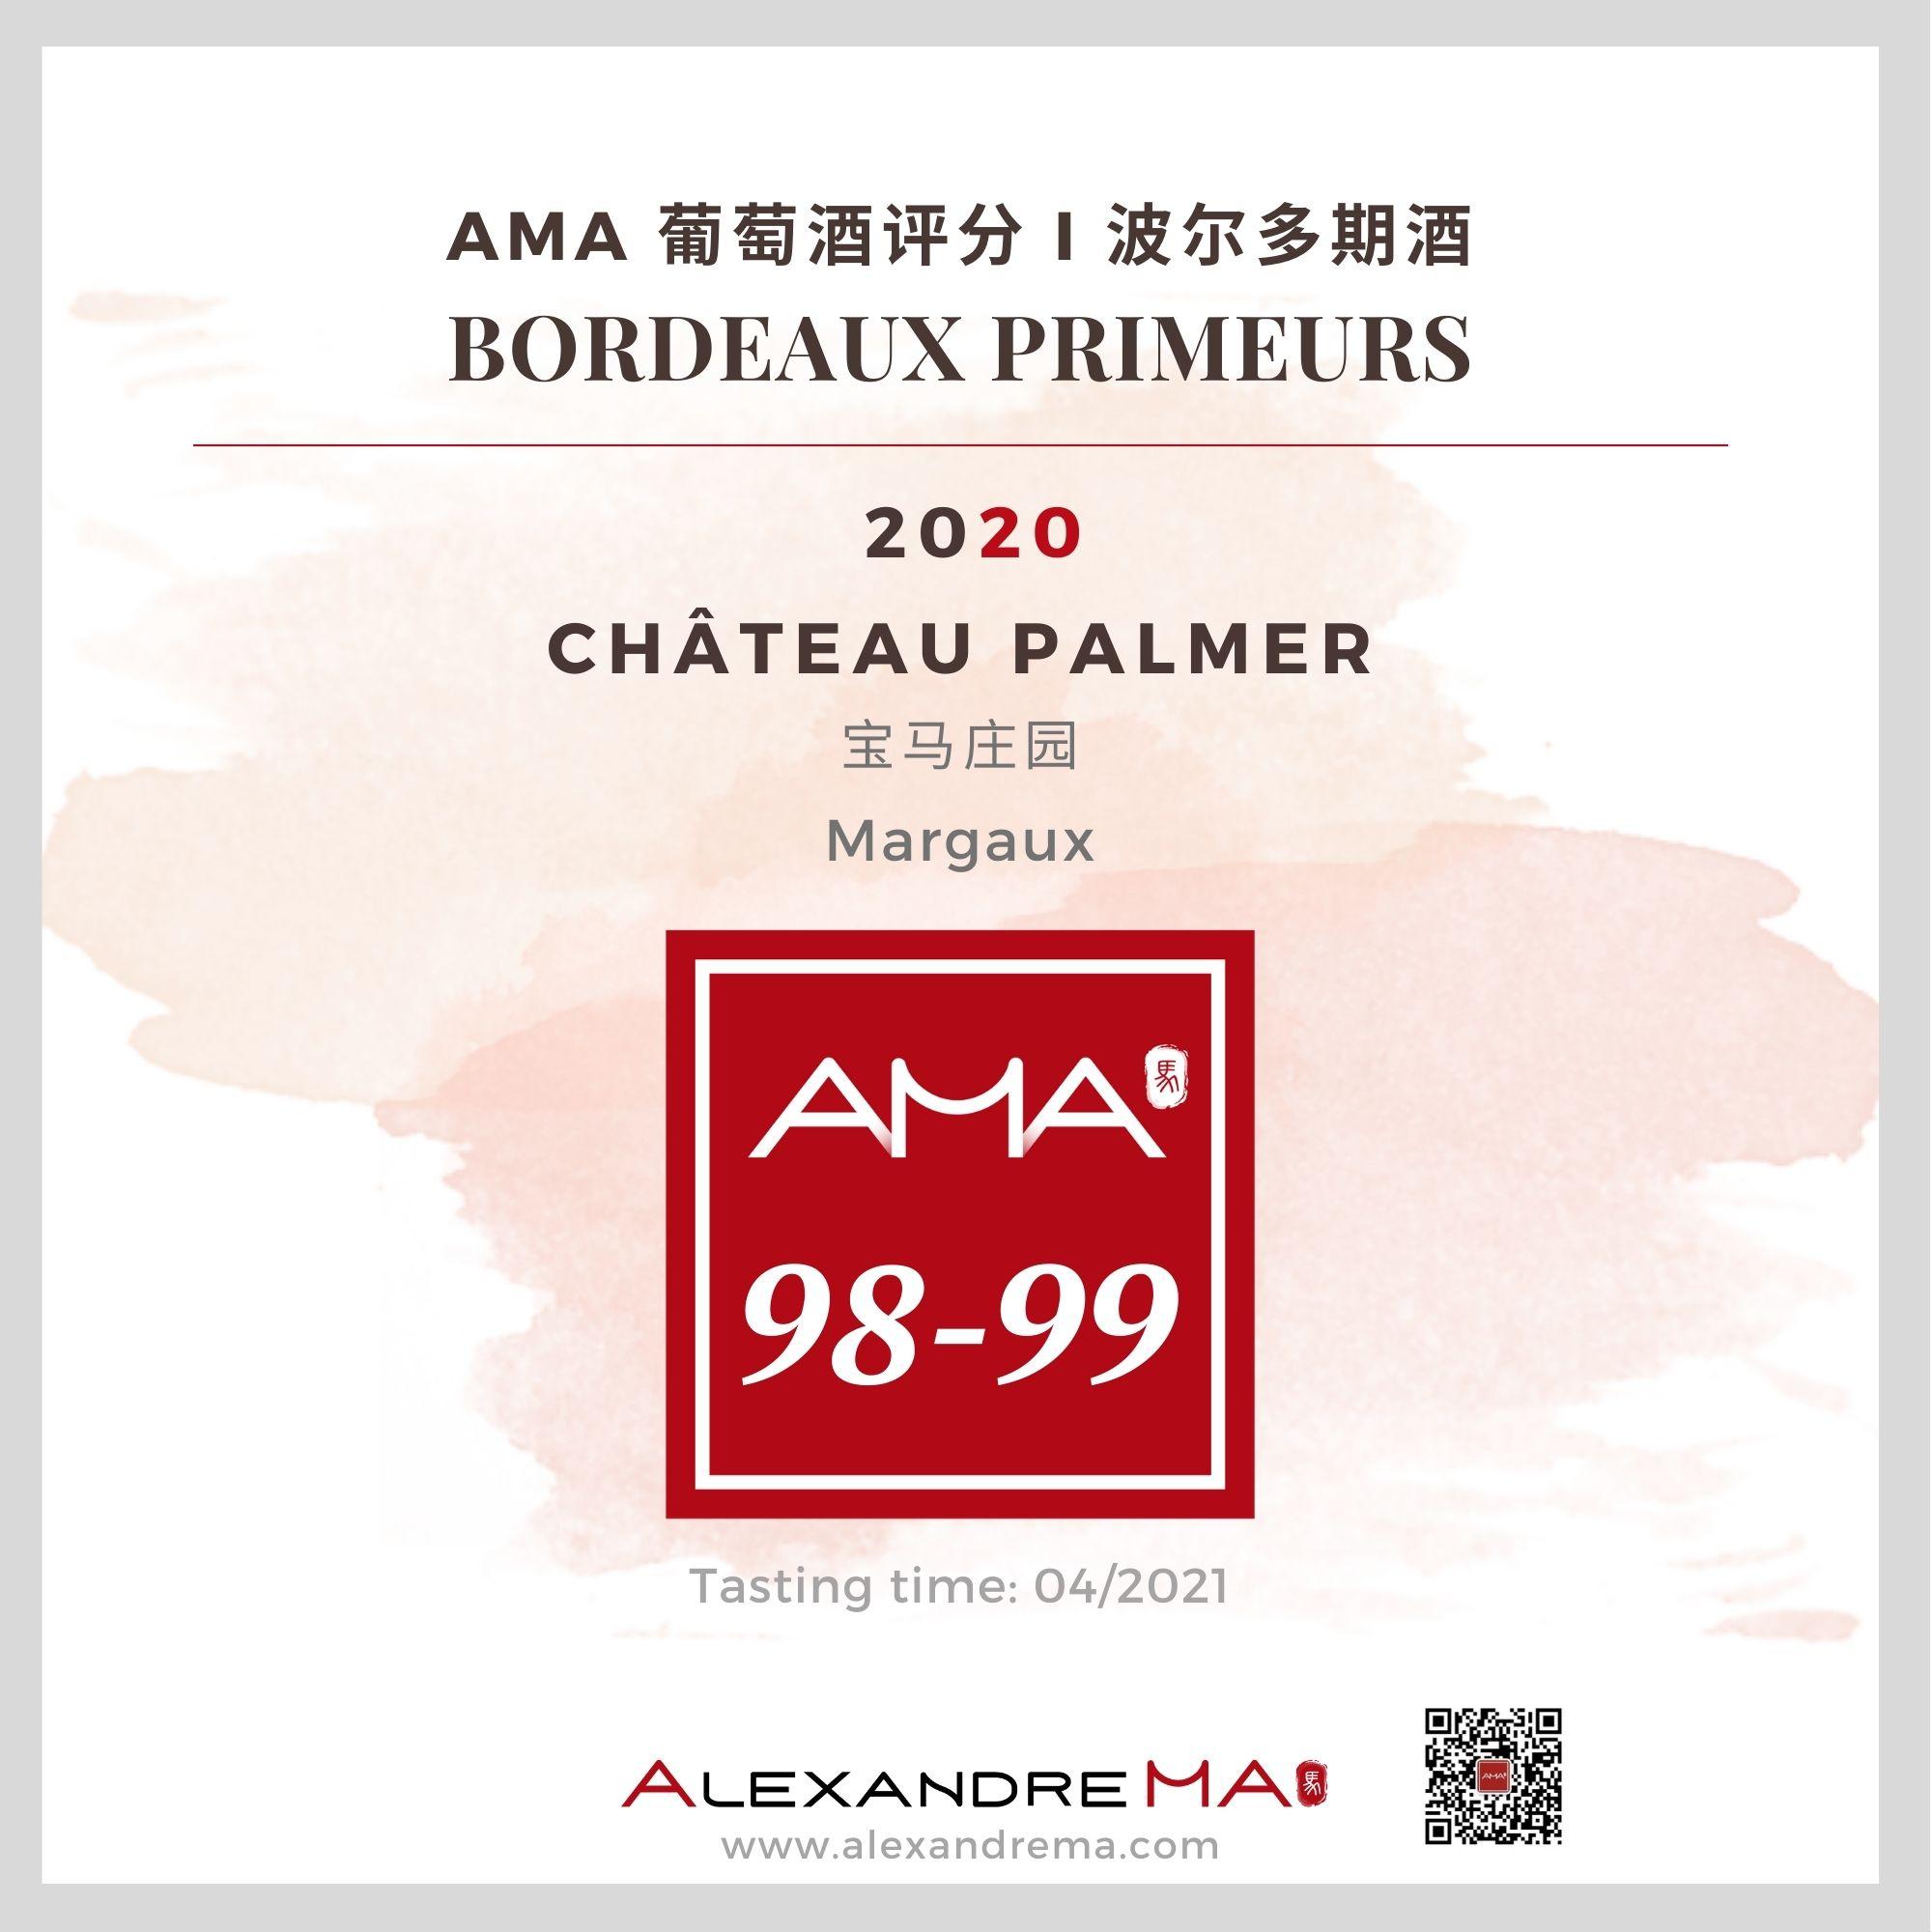 Château Palmer 2020 宝马庄园 - Alexandre Ma